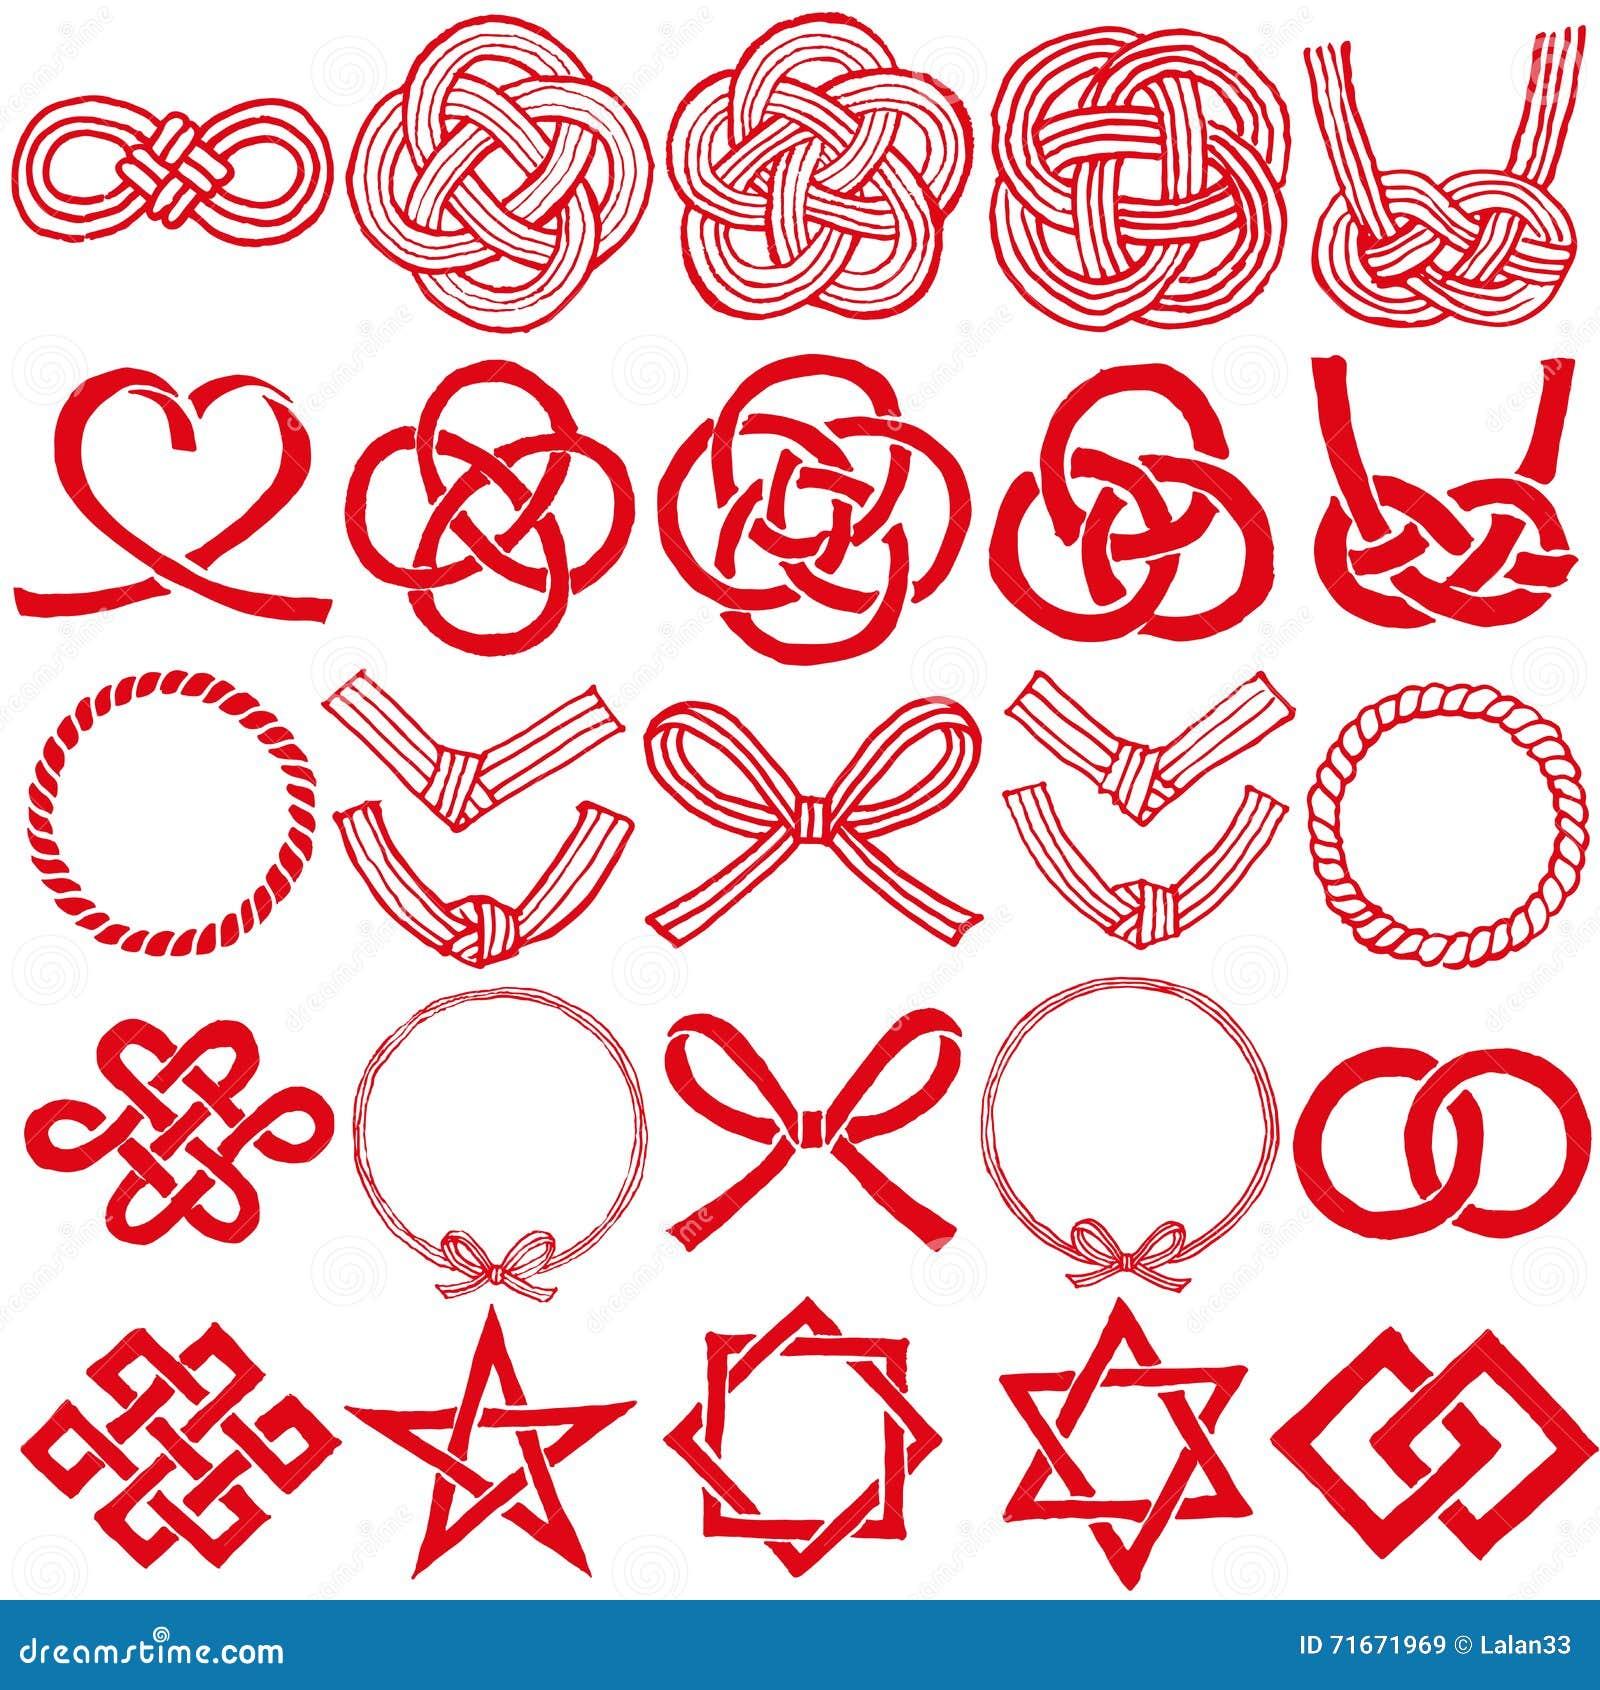 Mizuhiki and japanese family crests stock vector illustration mizuhiki and japanese family crests biocorpaavc Gallery